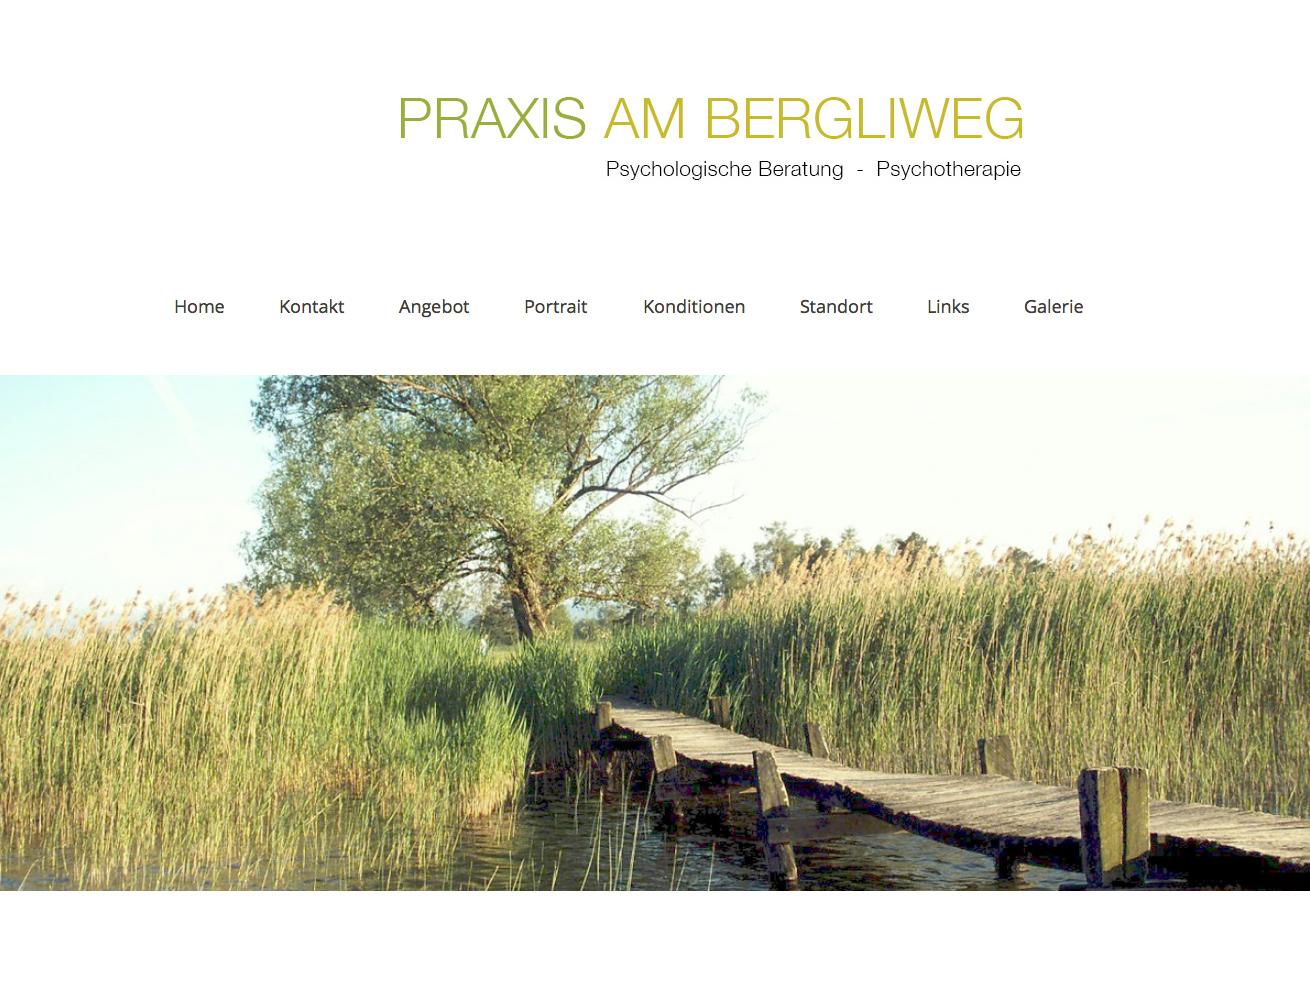 Praxis Am Bergliweg Andamy Raum Design